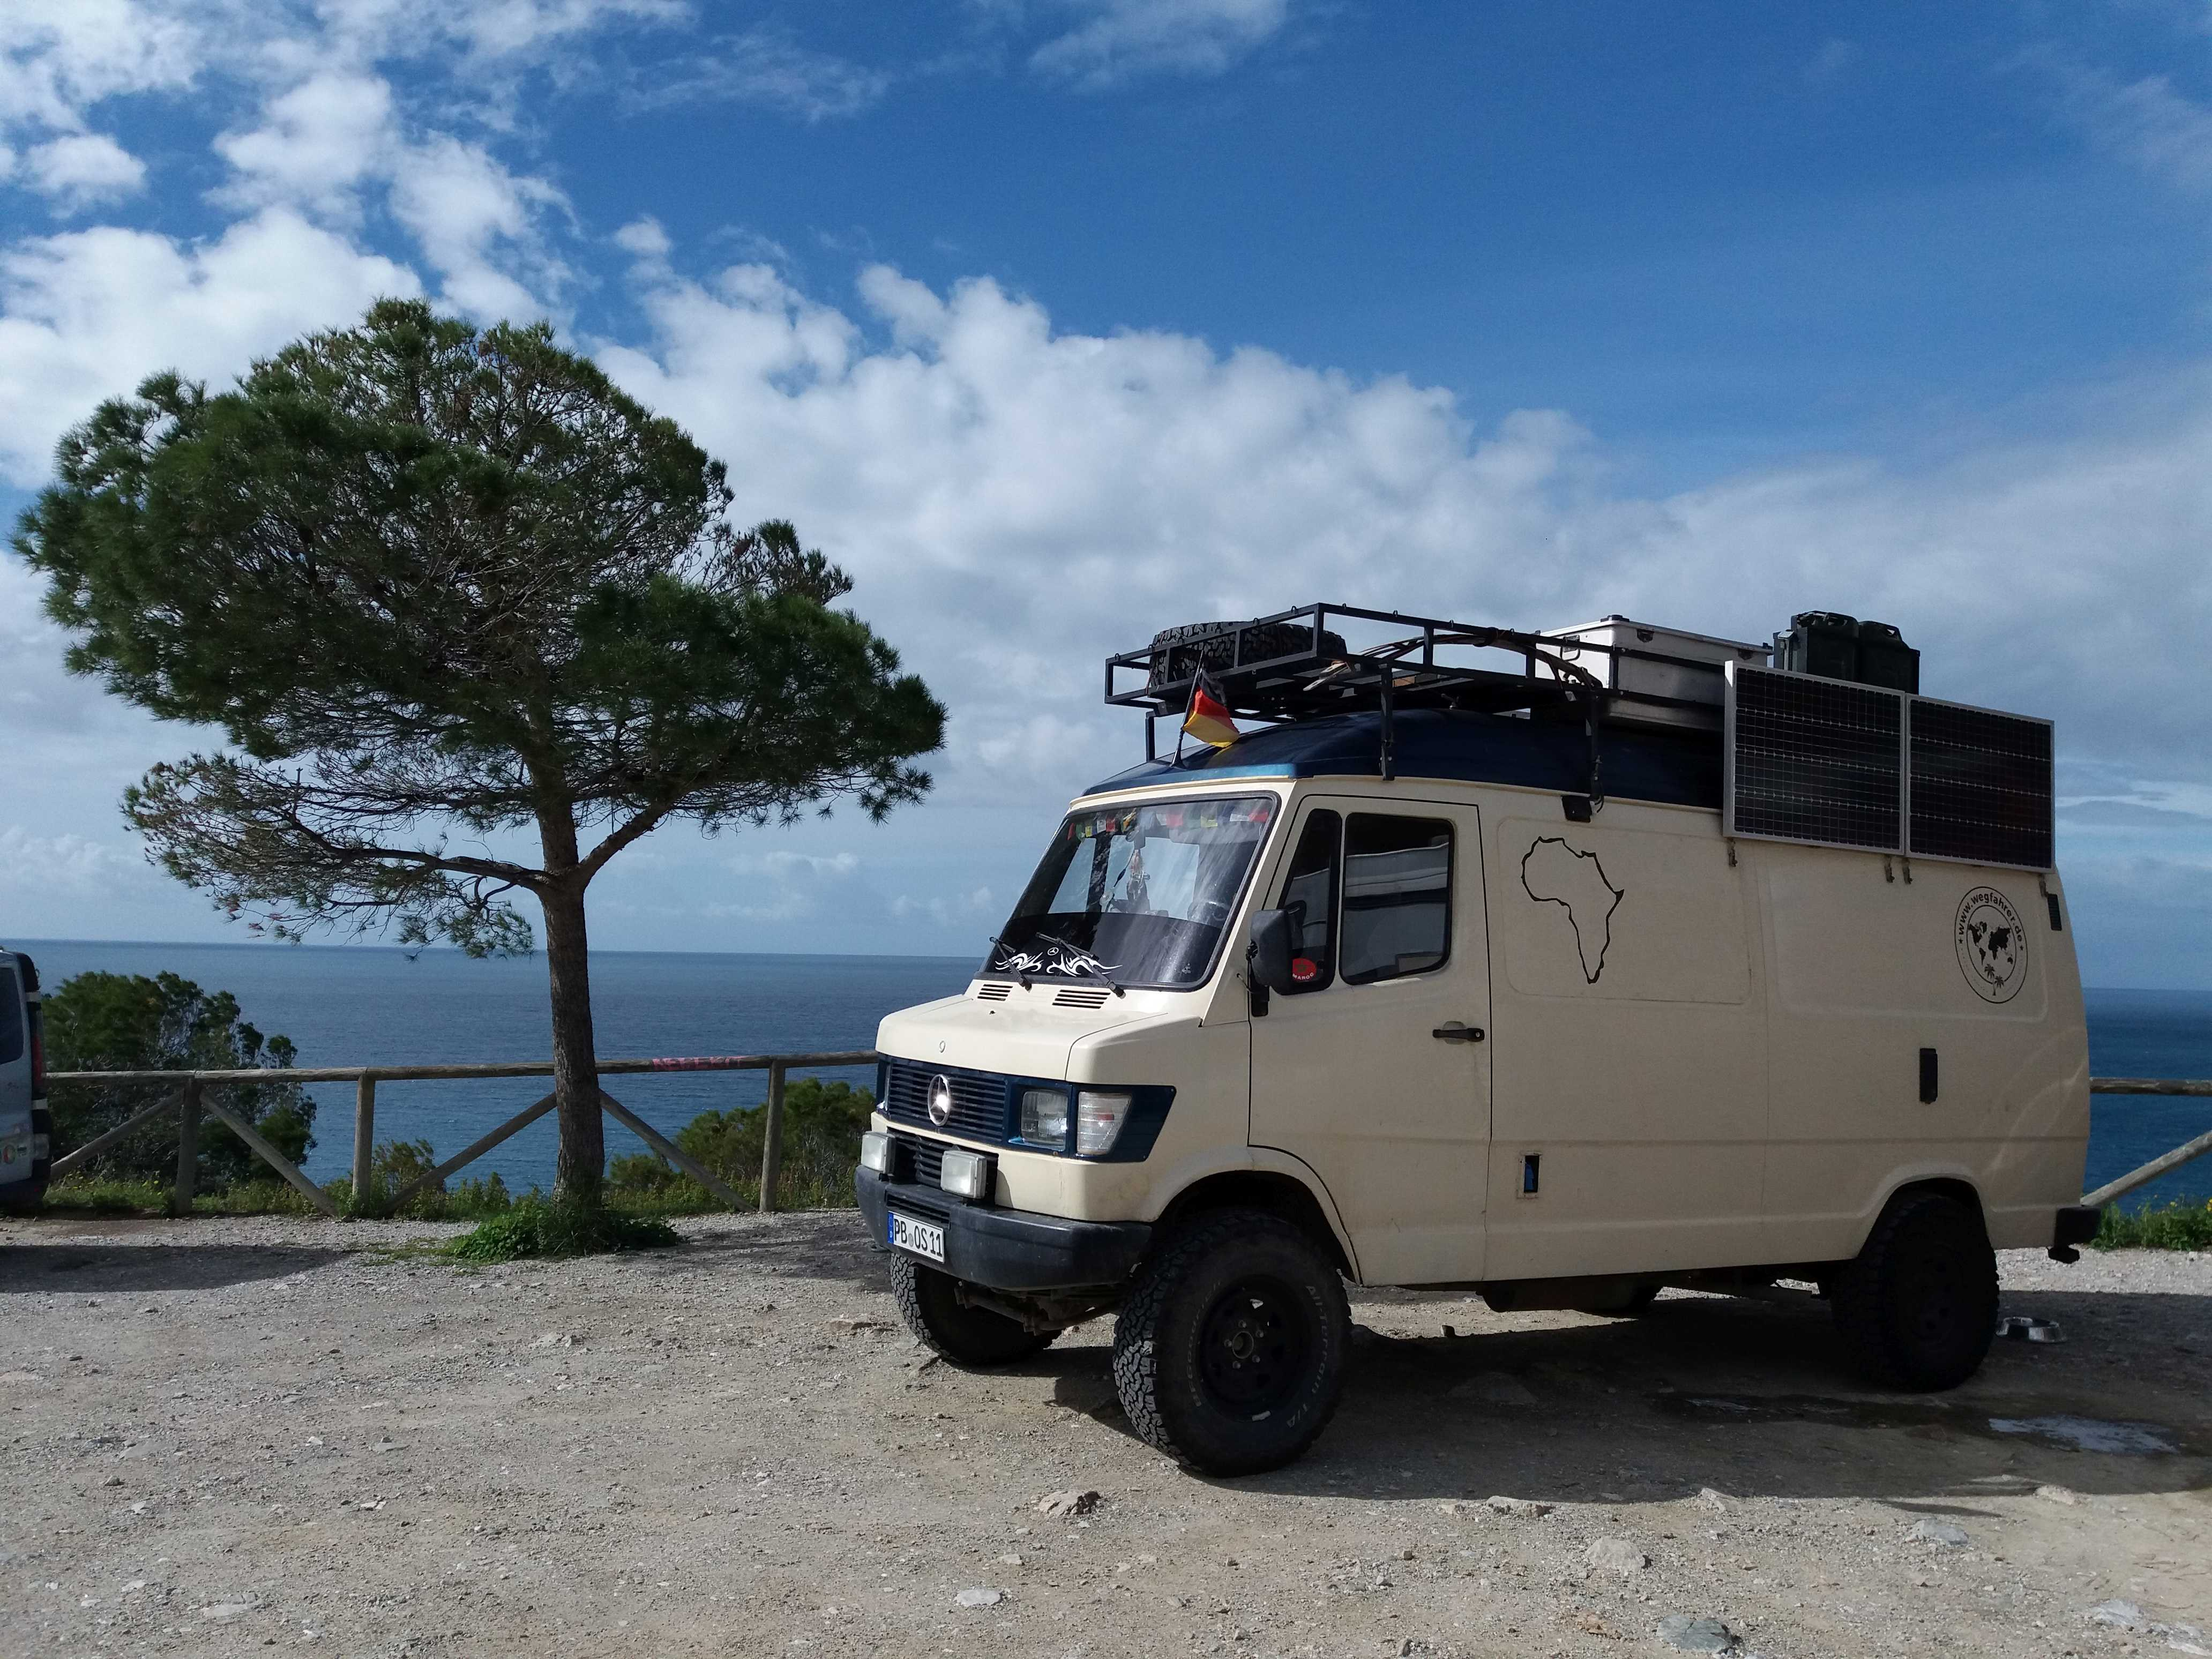 Roadbook – Ma'assalama Marokko, Hola España!